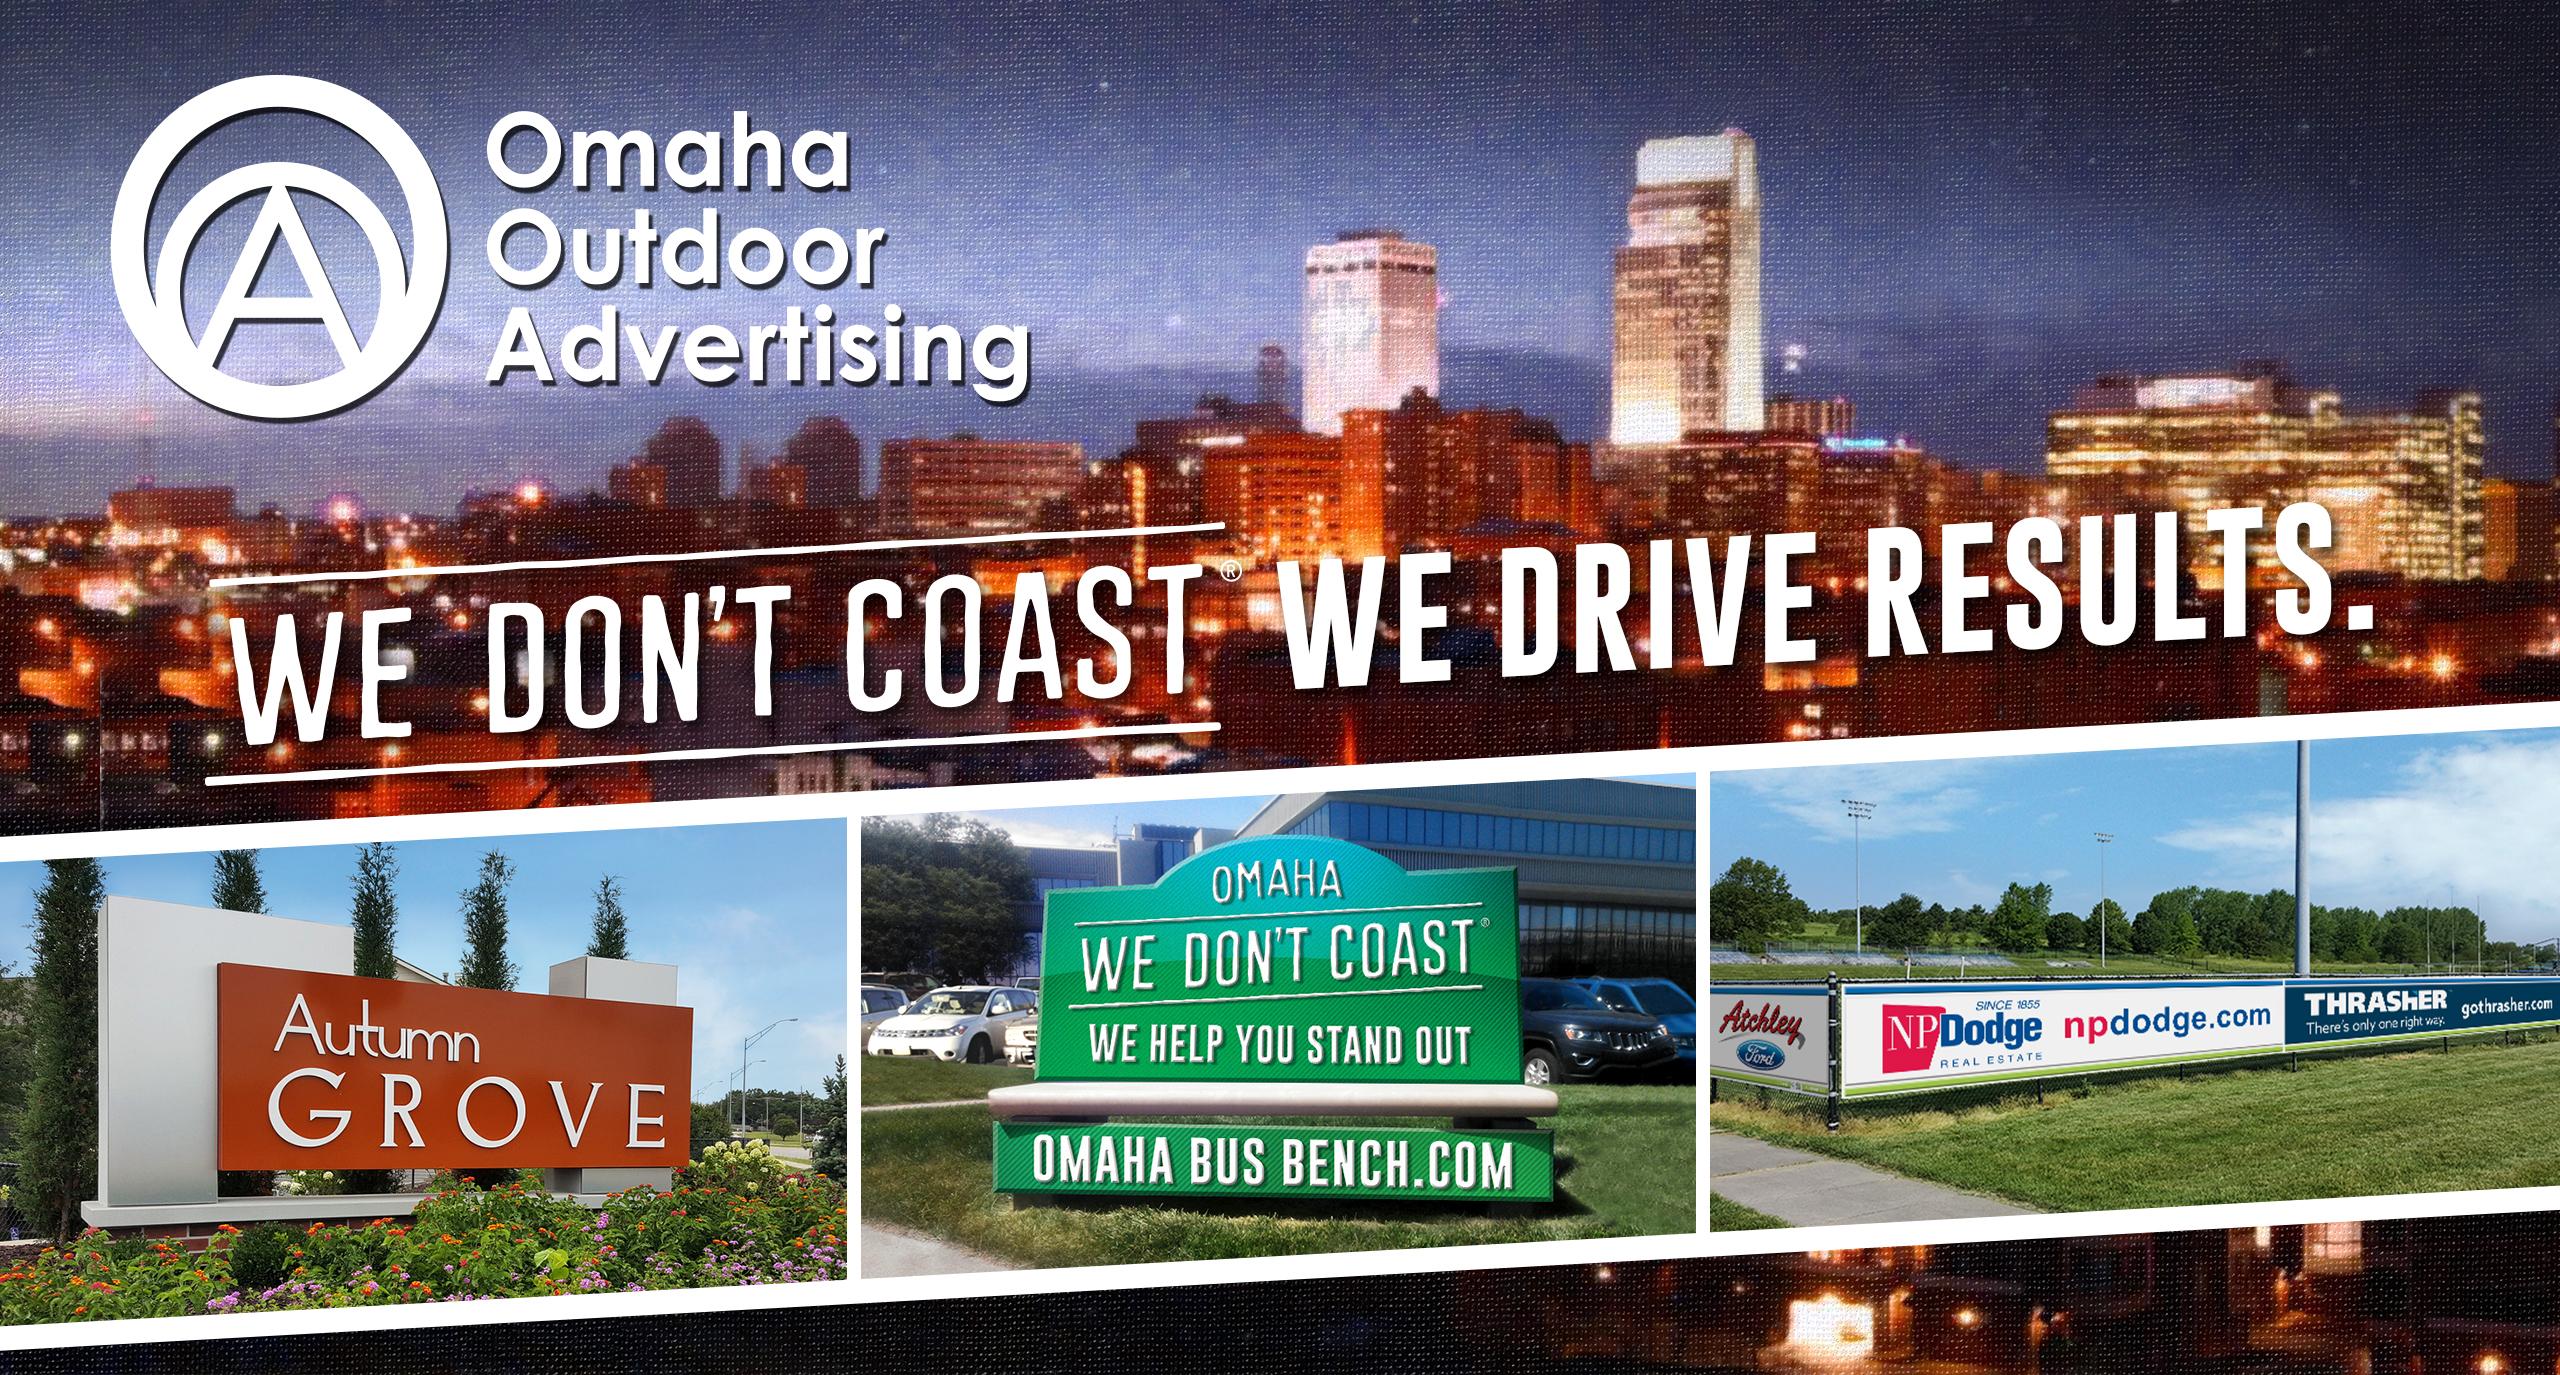 Omaha Outdoor Advertising